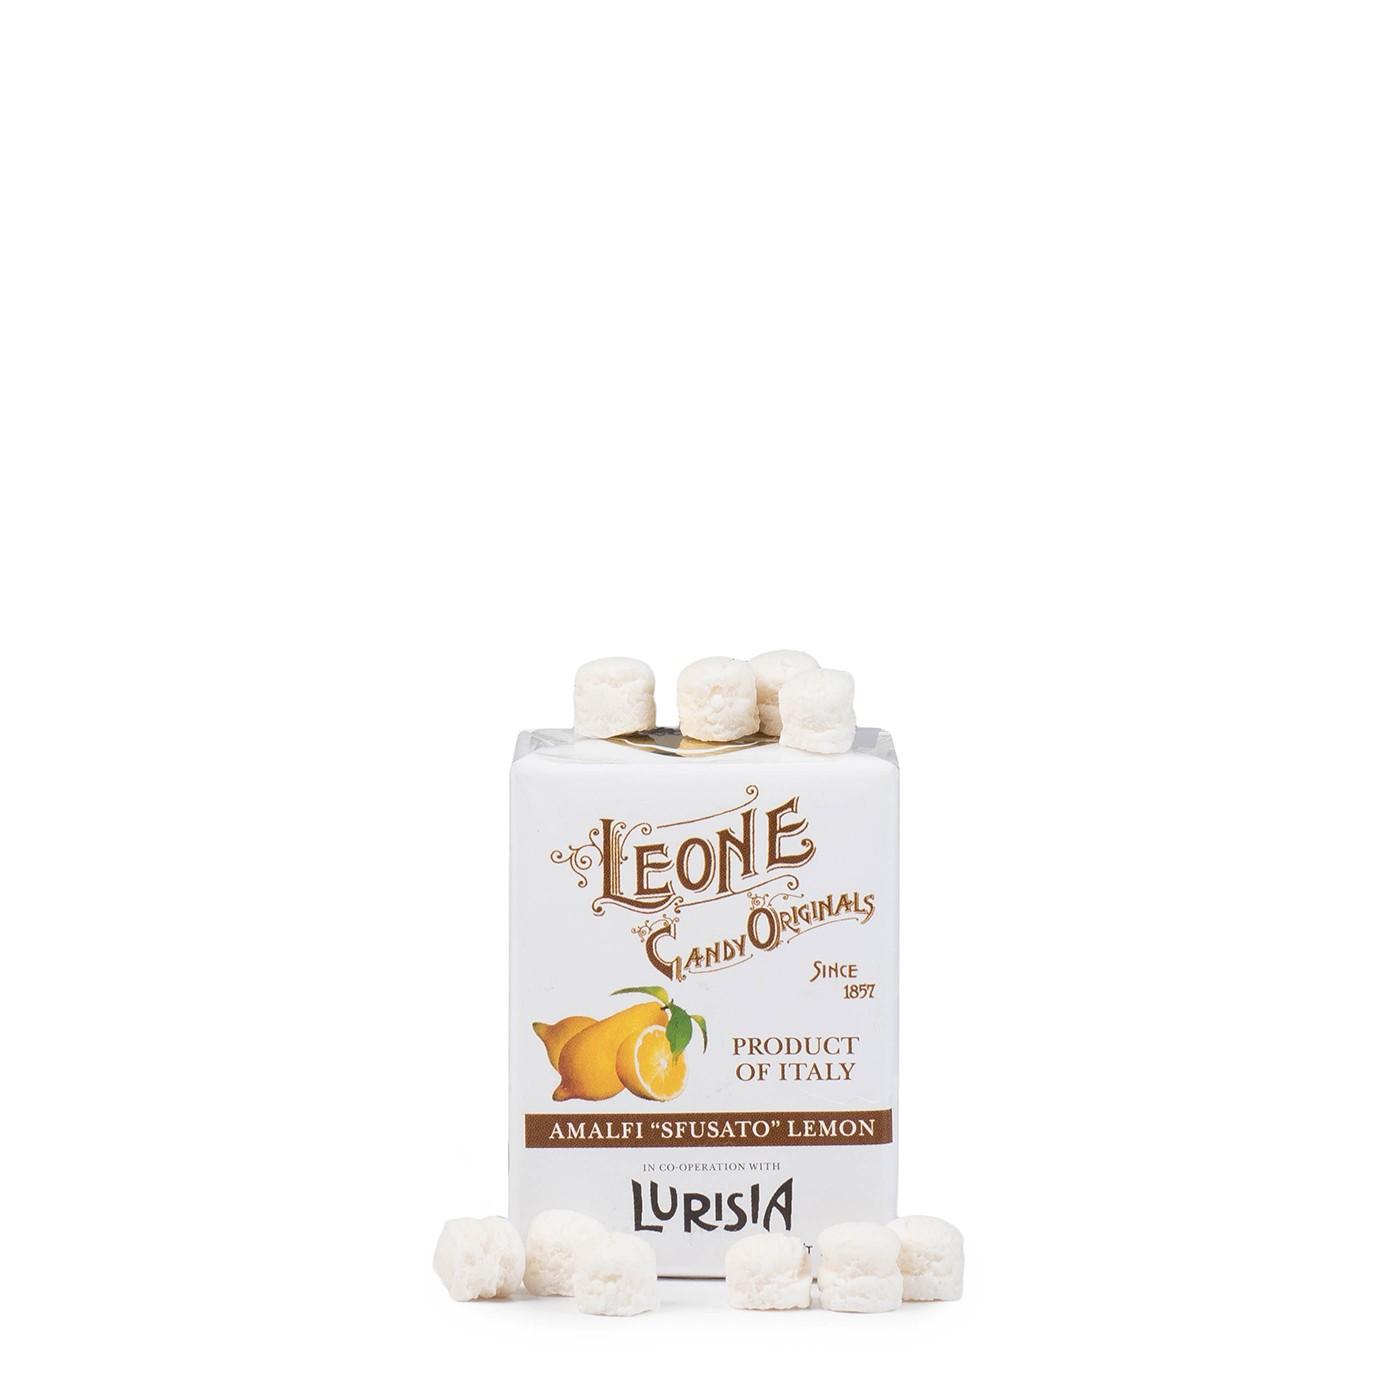 Amalfi Lemon Candies 1.1 oz